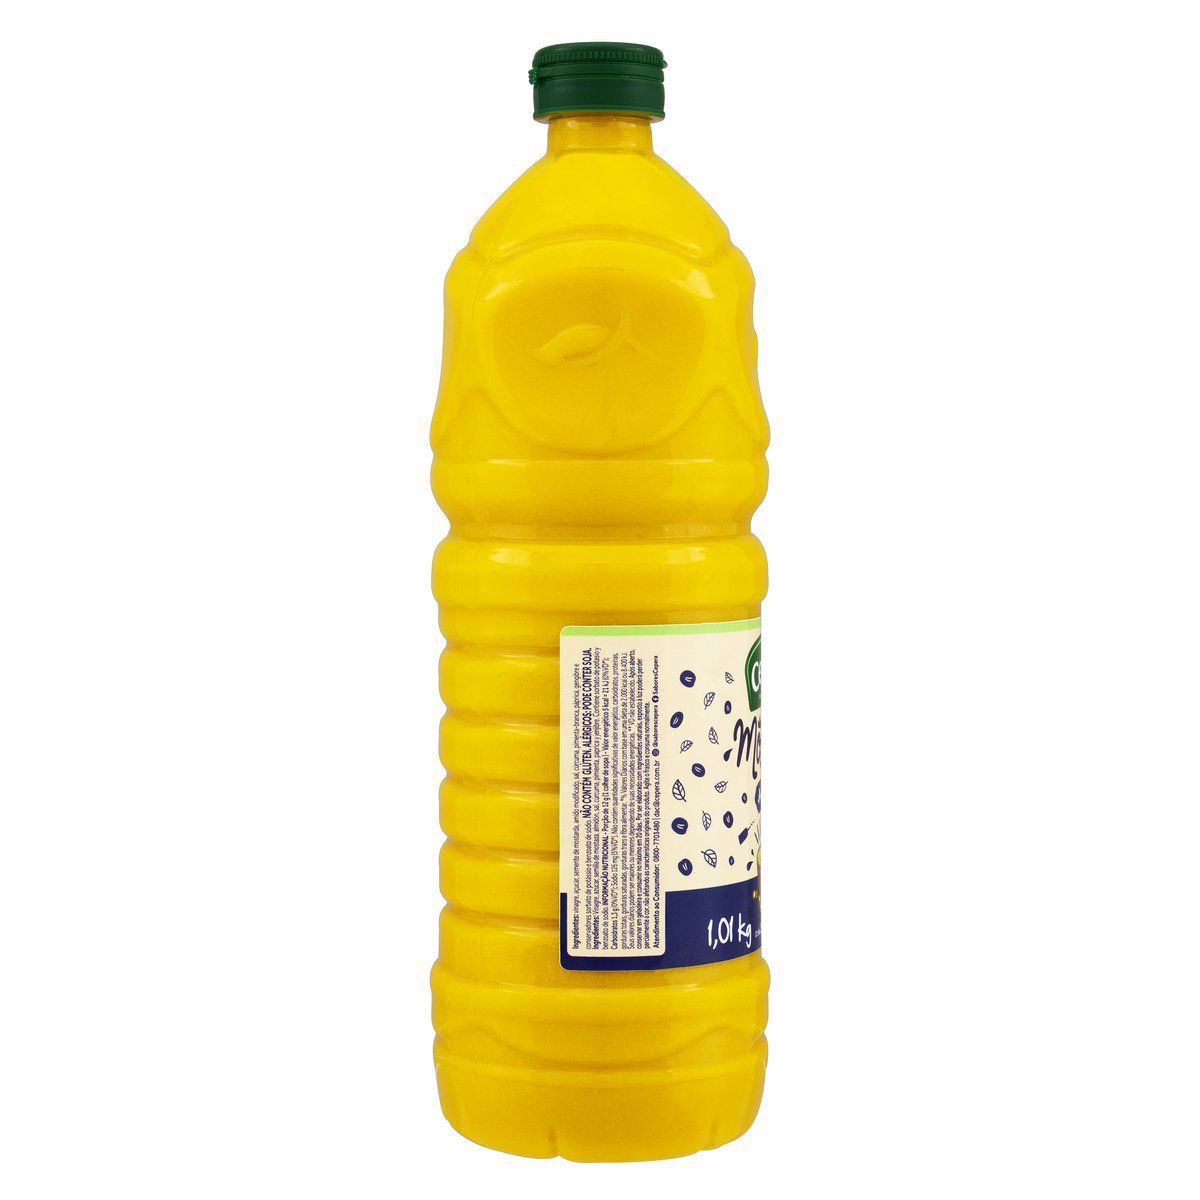 Mostarda Amarela 1,01kg